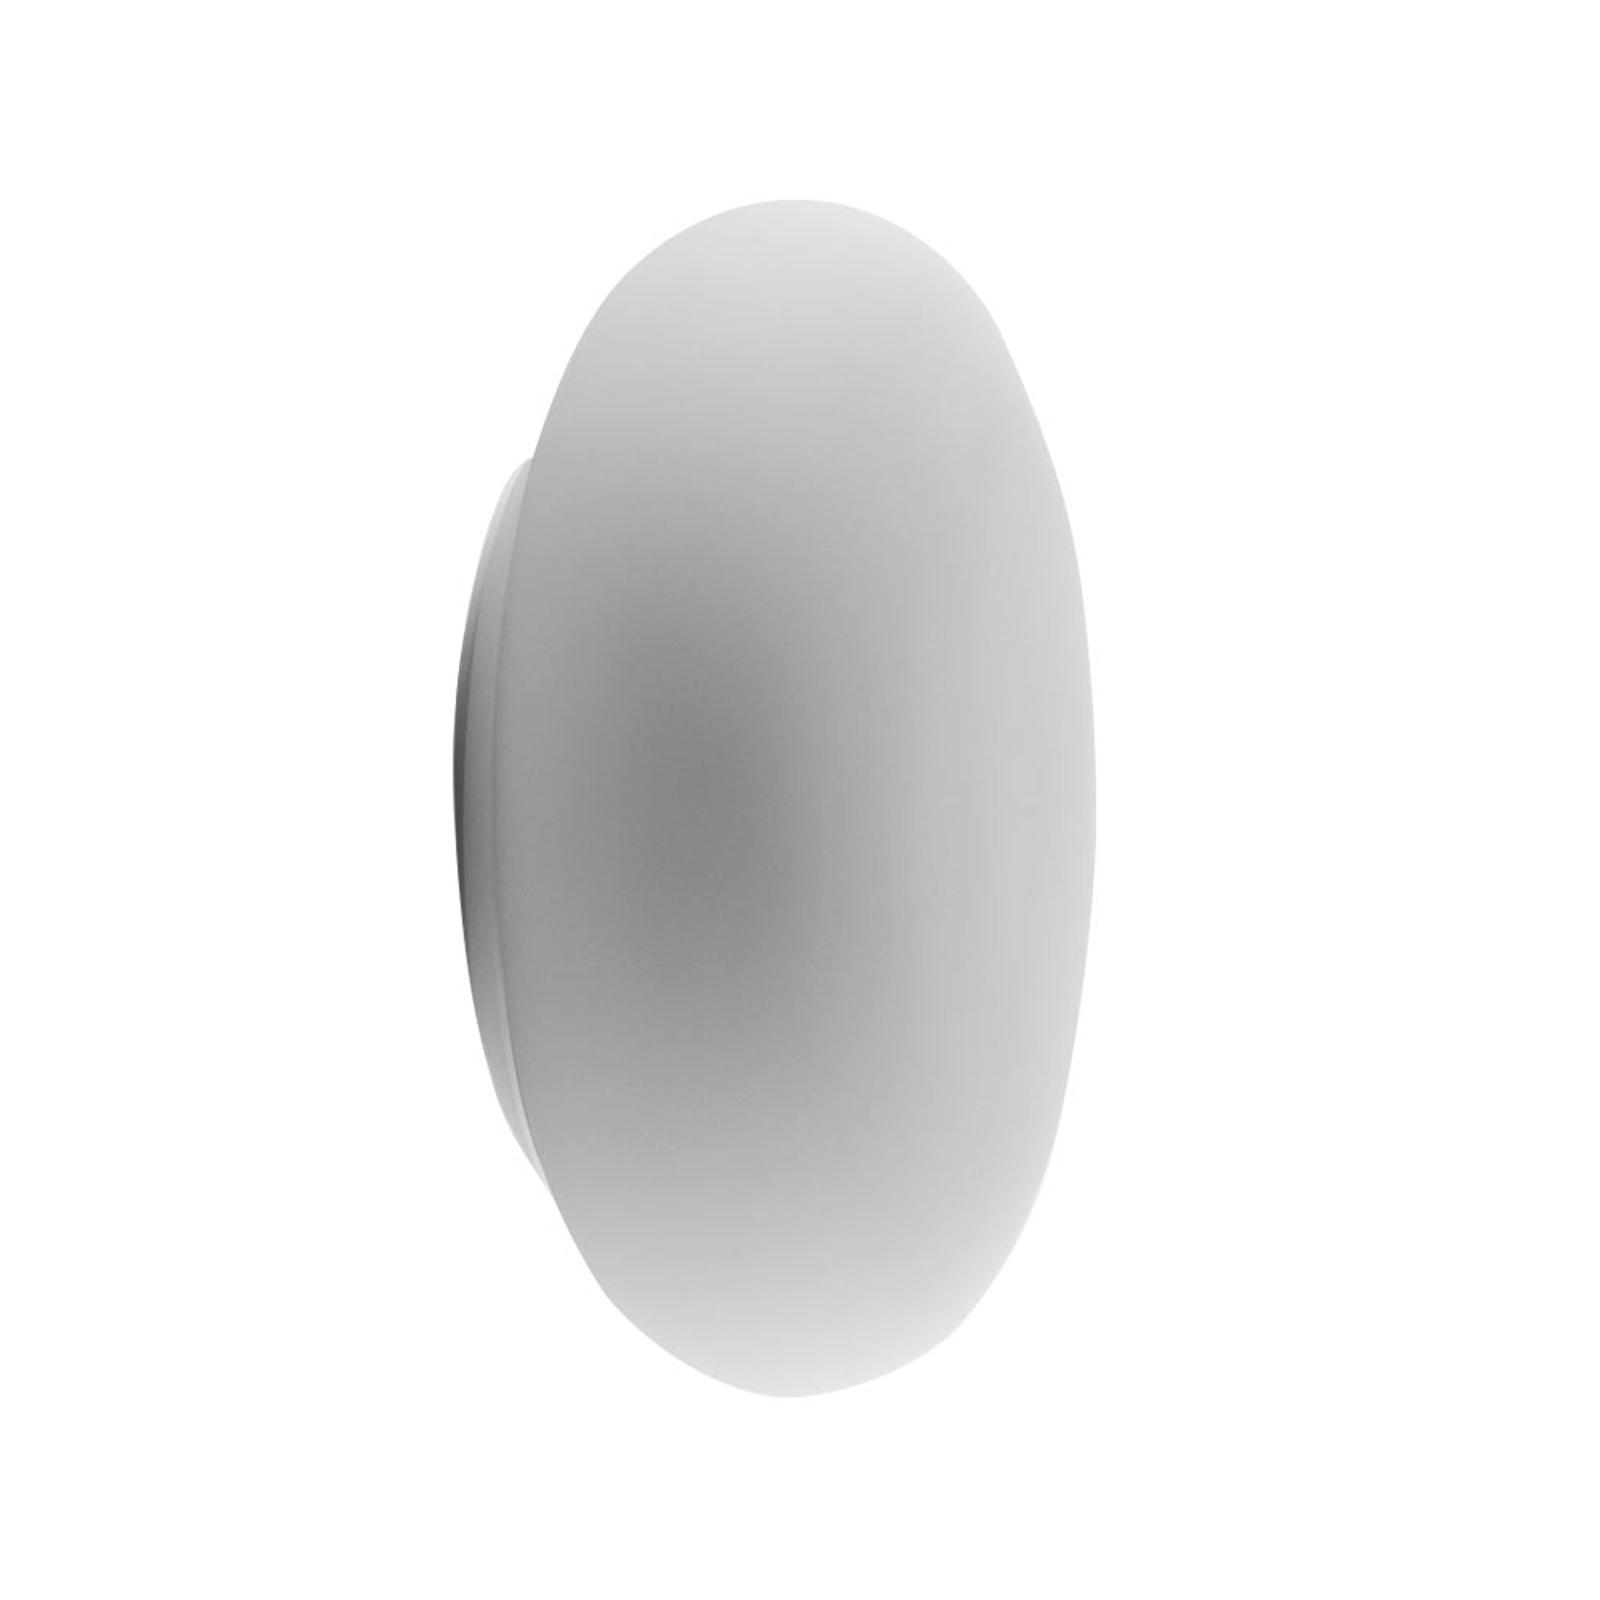 Artemide Itka Glas-Wandleuchte IP65 Ø 20 cm